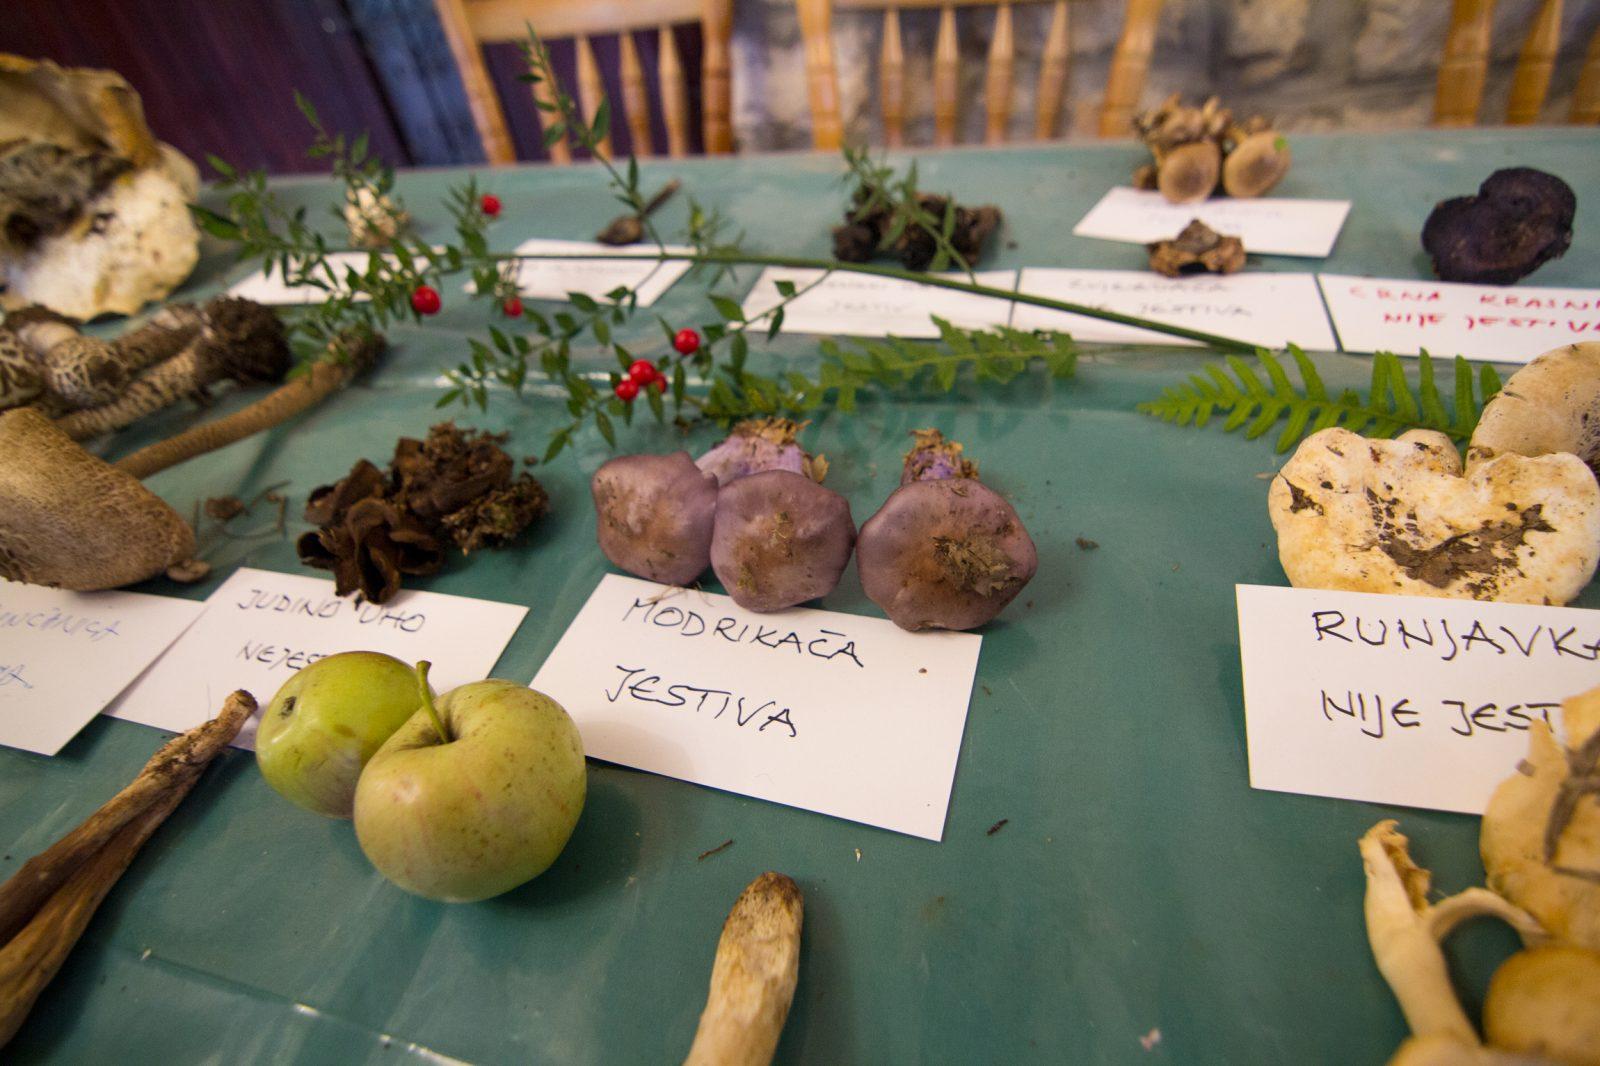 ISTRIAN AGRITOURISM OPEN DOOR DAYS IN SVETI MARTIN NEAR LABIN